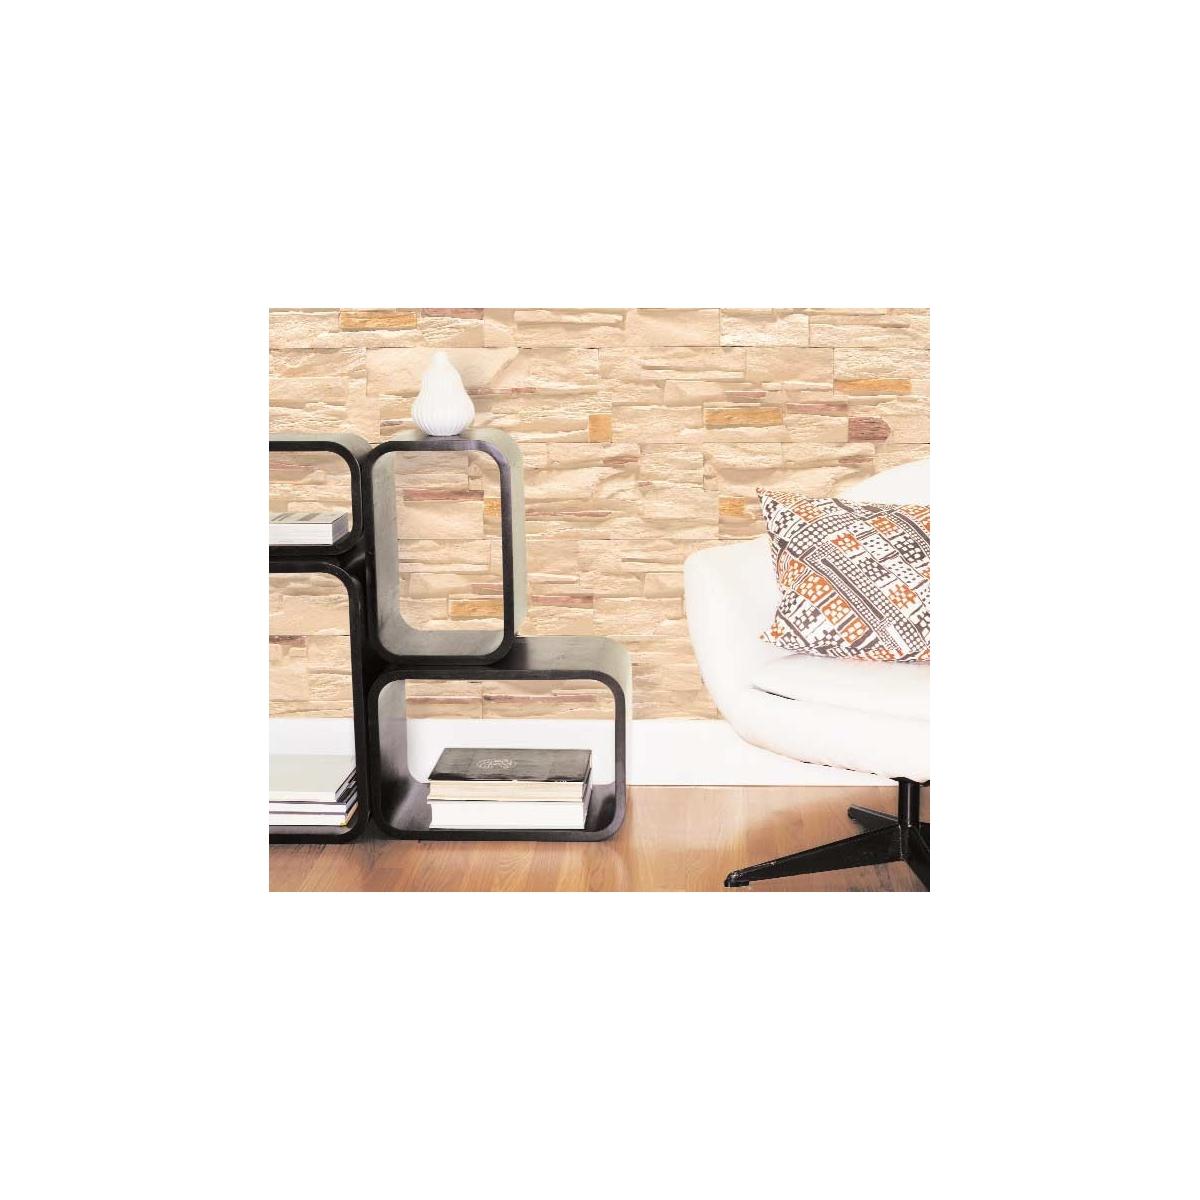 Plaqueta R59 Chicago (Caja 1m2) - Revestimiento con Plaquetas de yeso - Marca Revesti-Mur